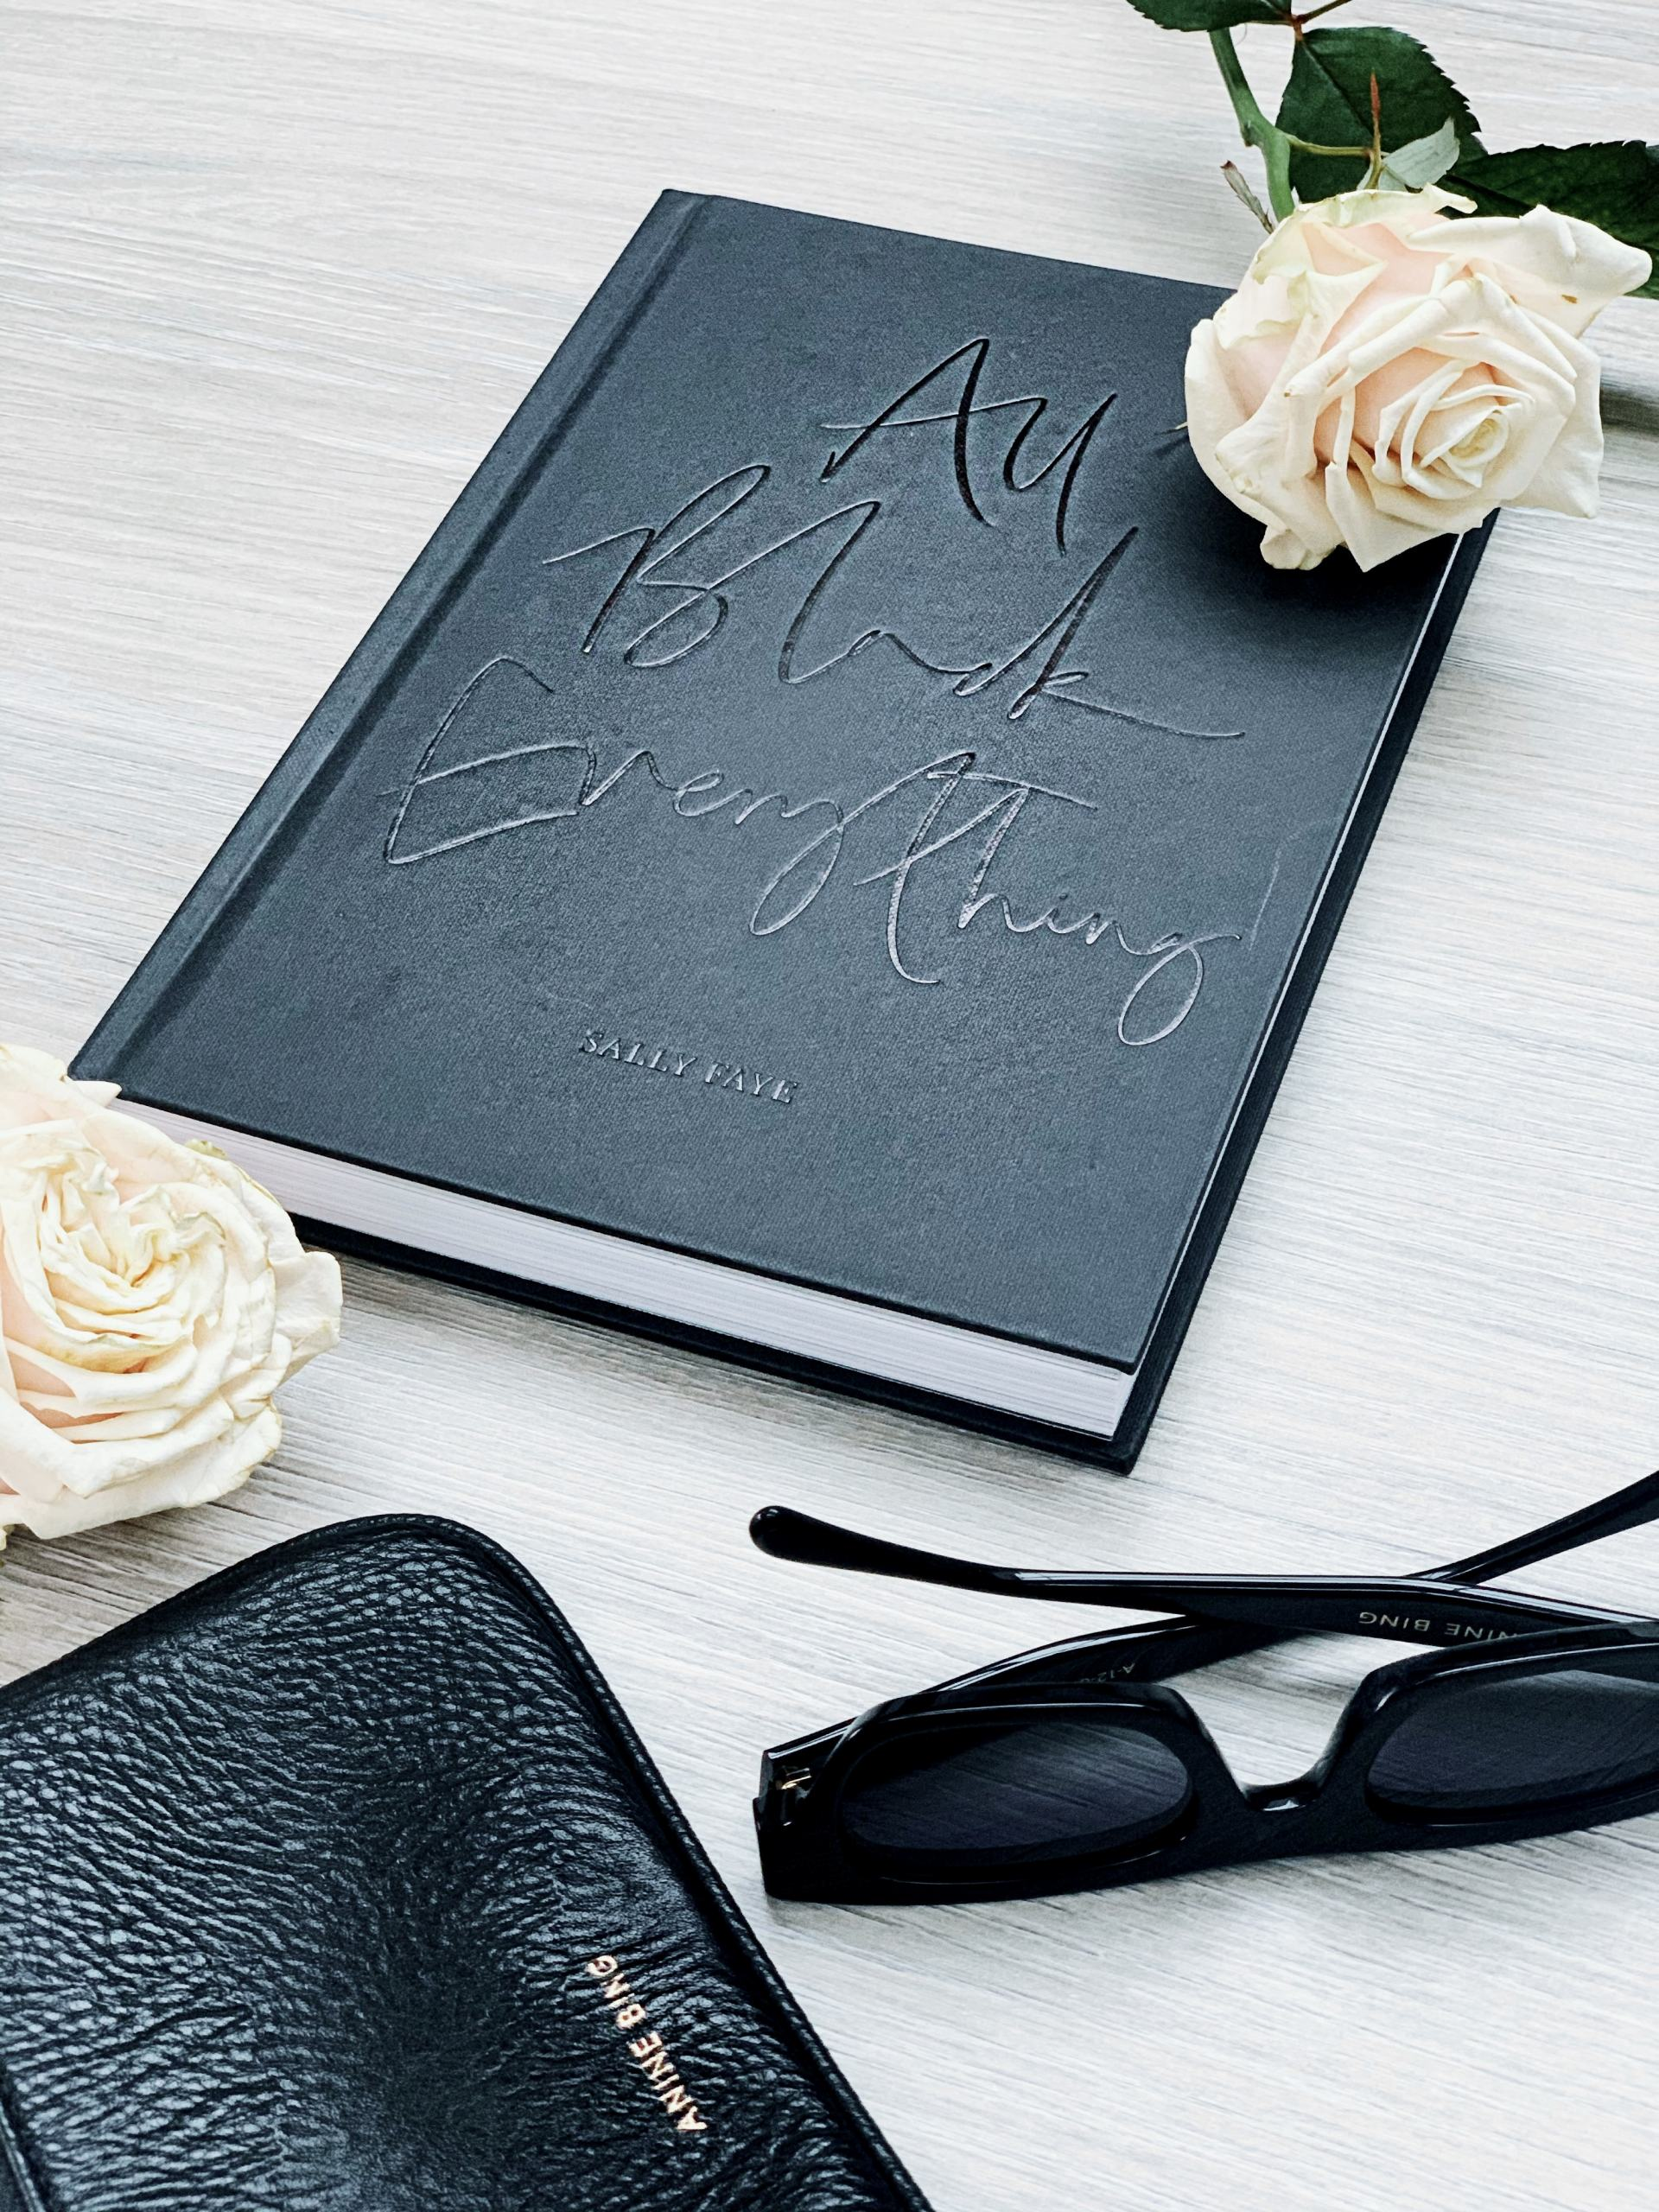 Black stylish accessories